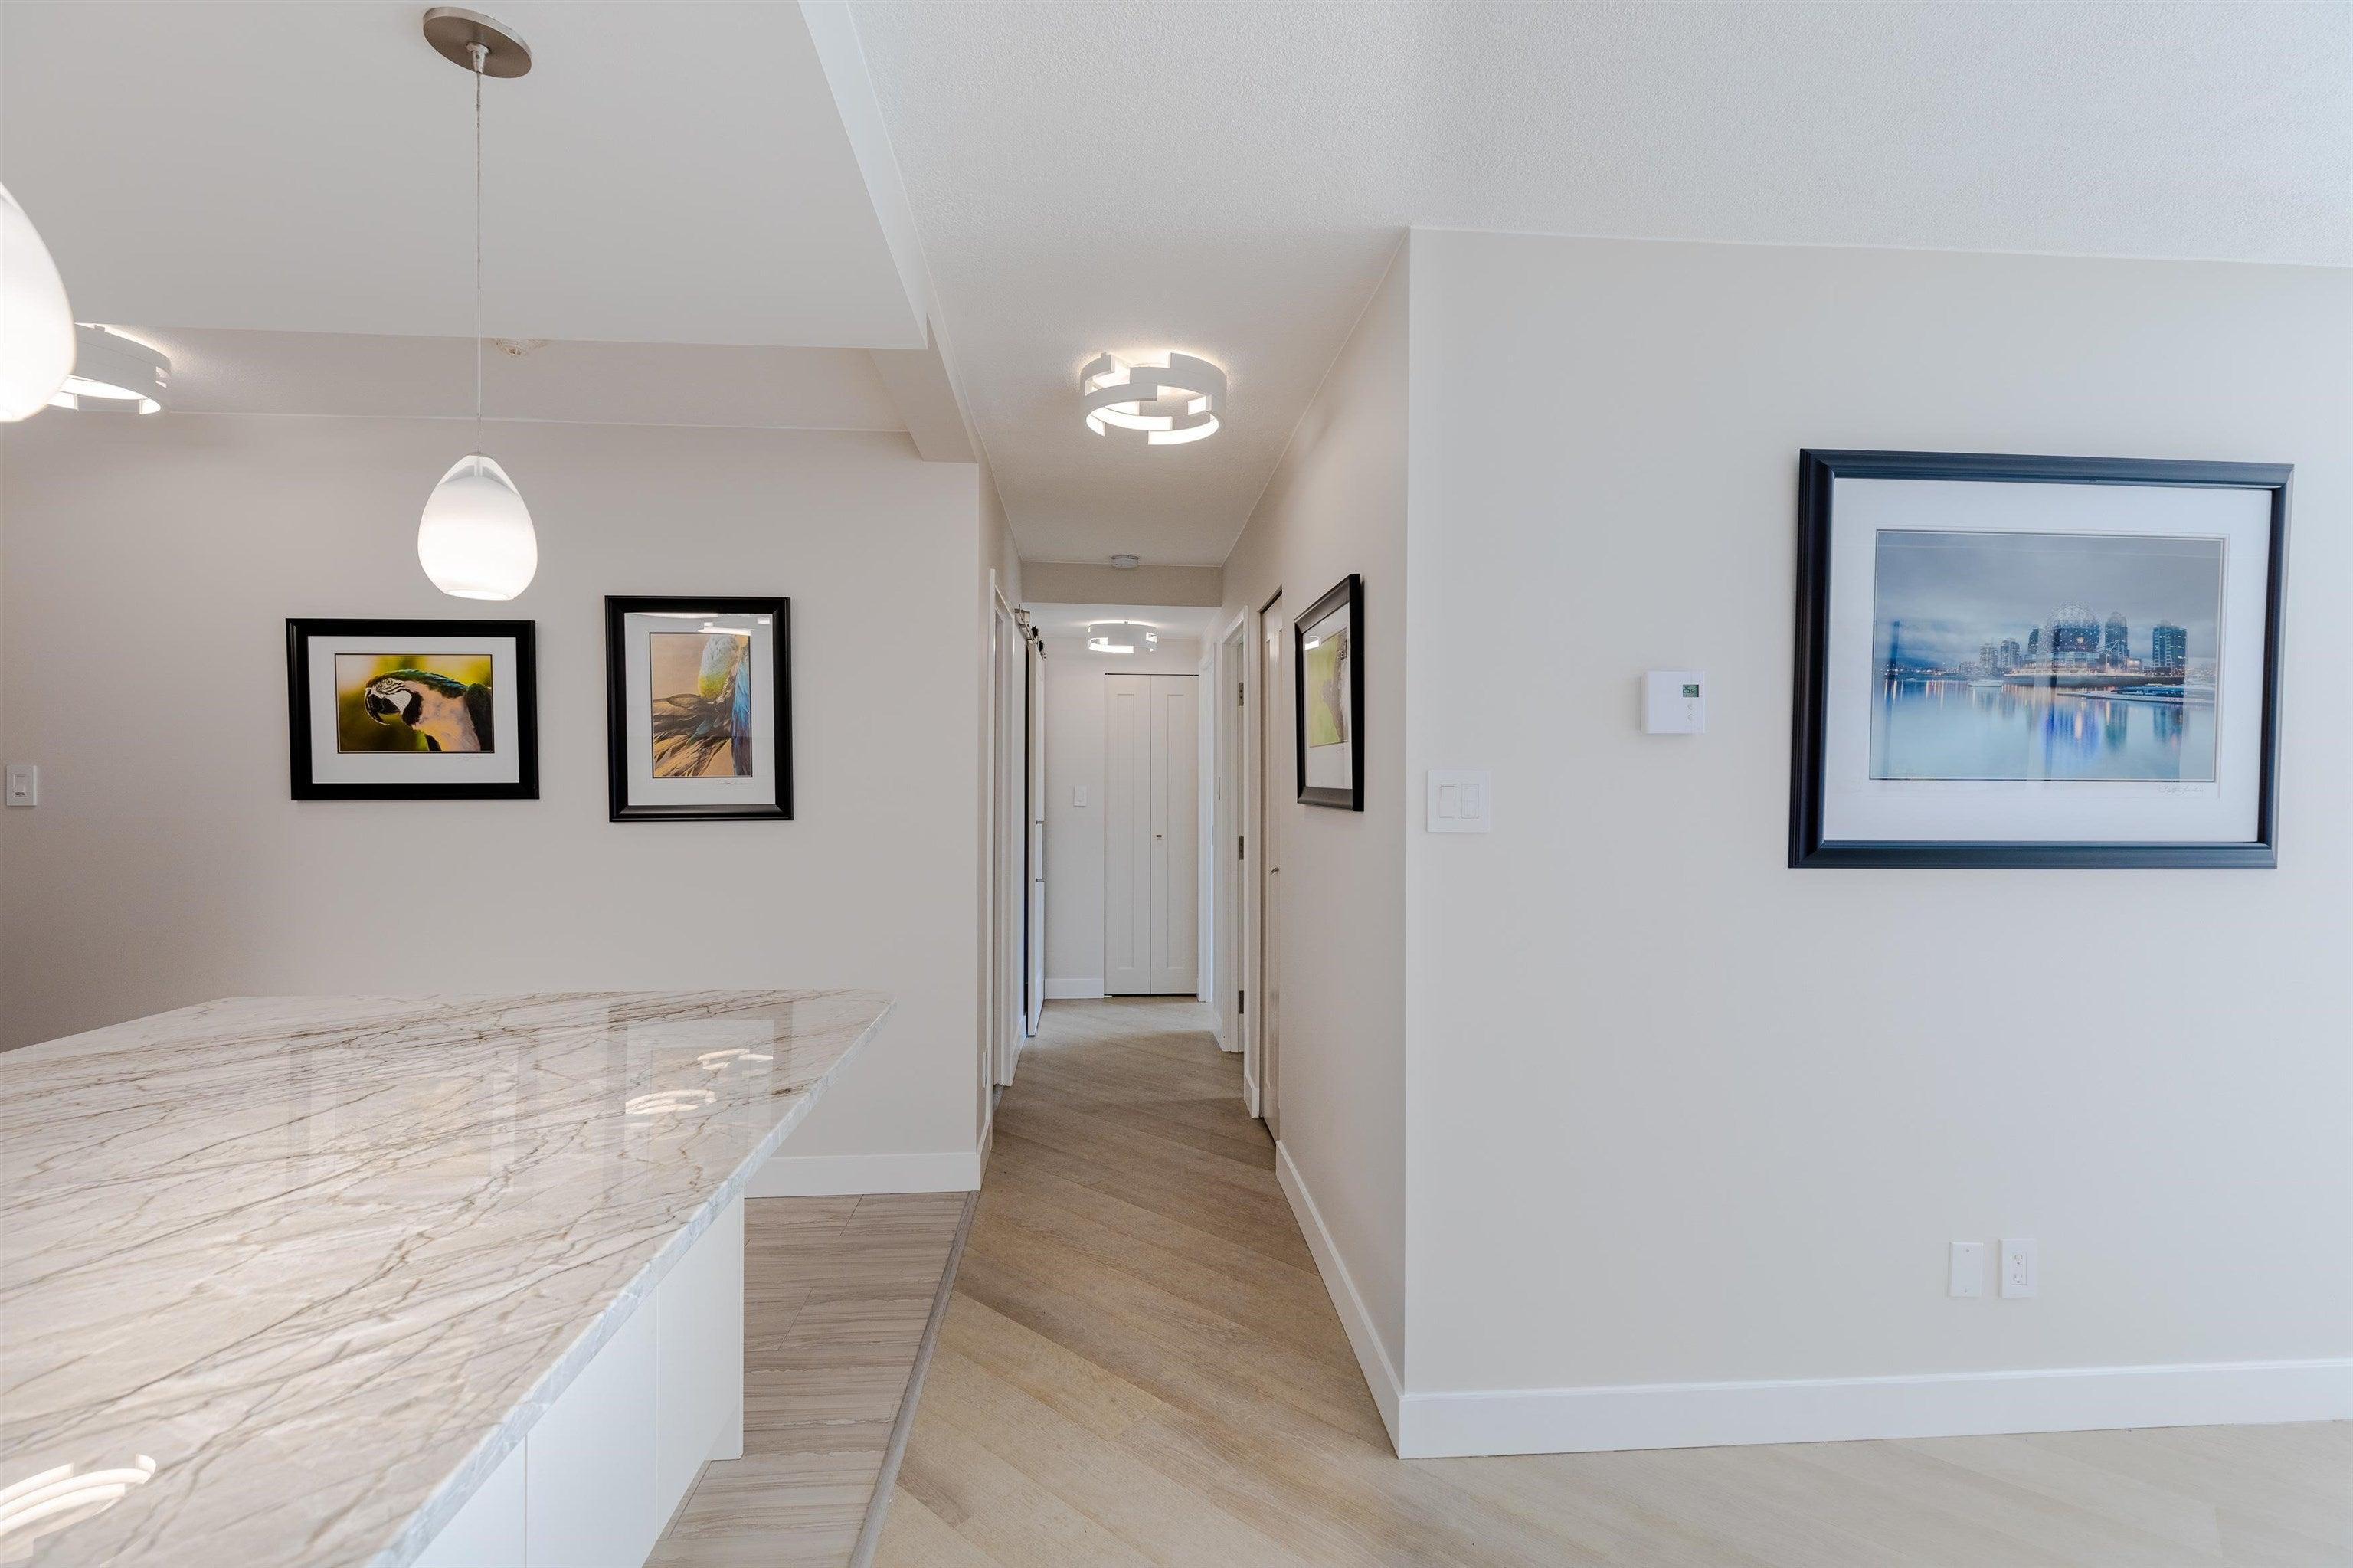 406 1450 PENNYFARTHING DRIVE - False Creek Apartment/Condo for sale, 2 Bedrooms (R2617259) - #17